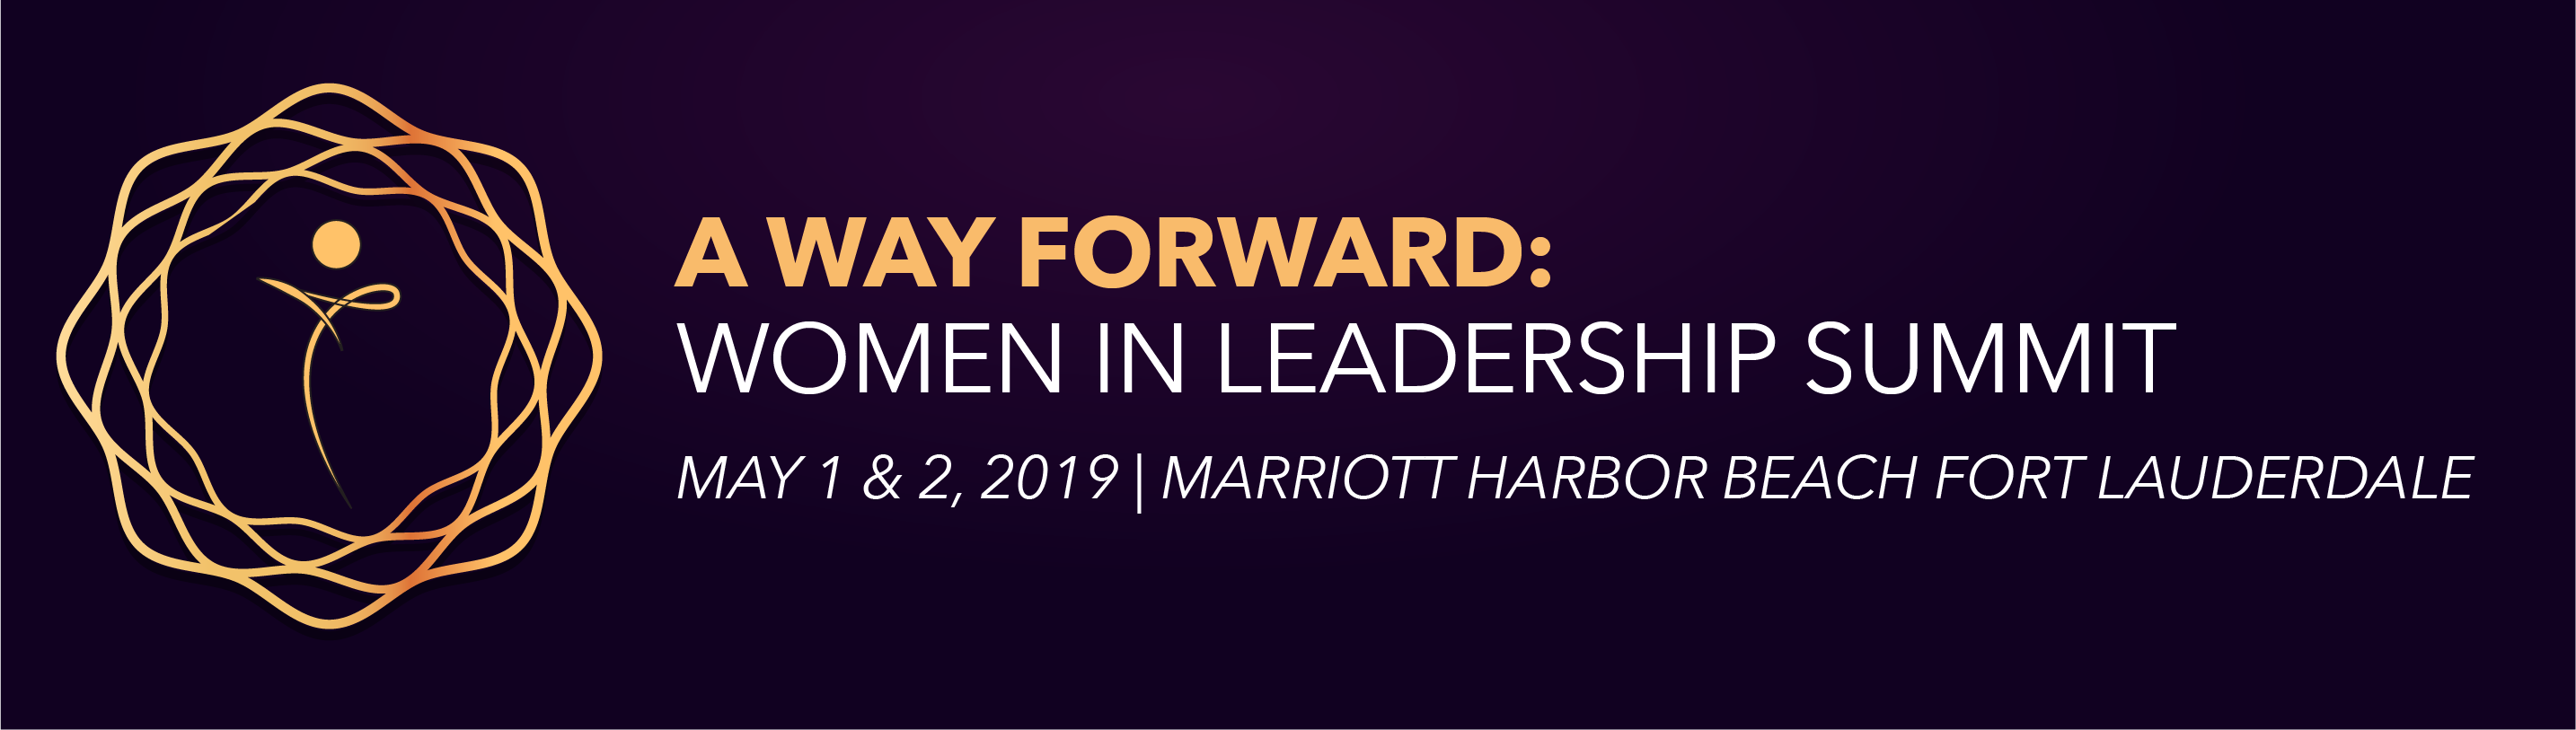 A Way Forward: Women In Leadership Summit 2019